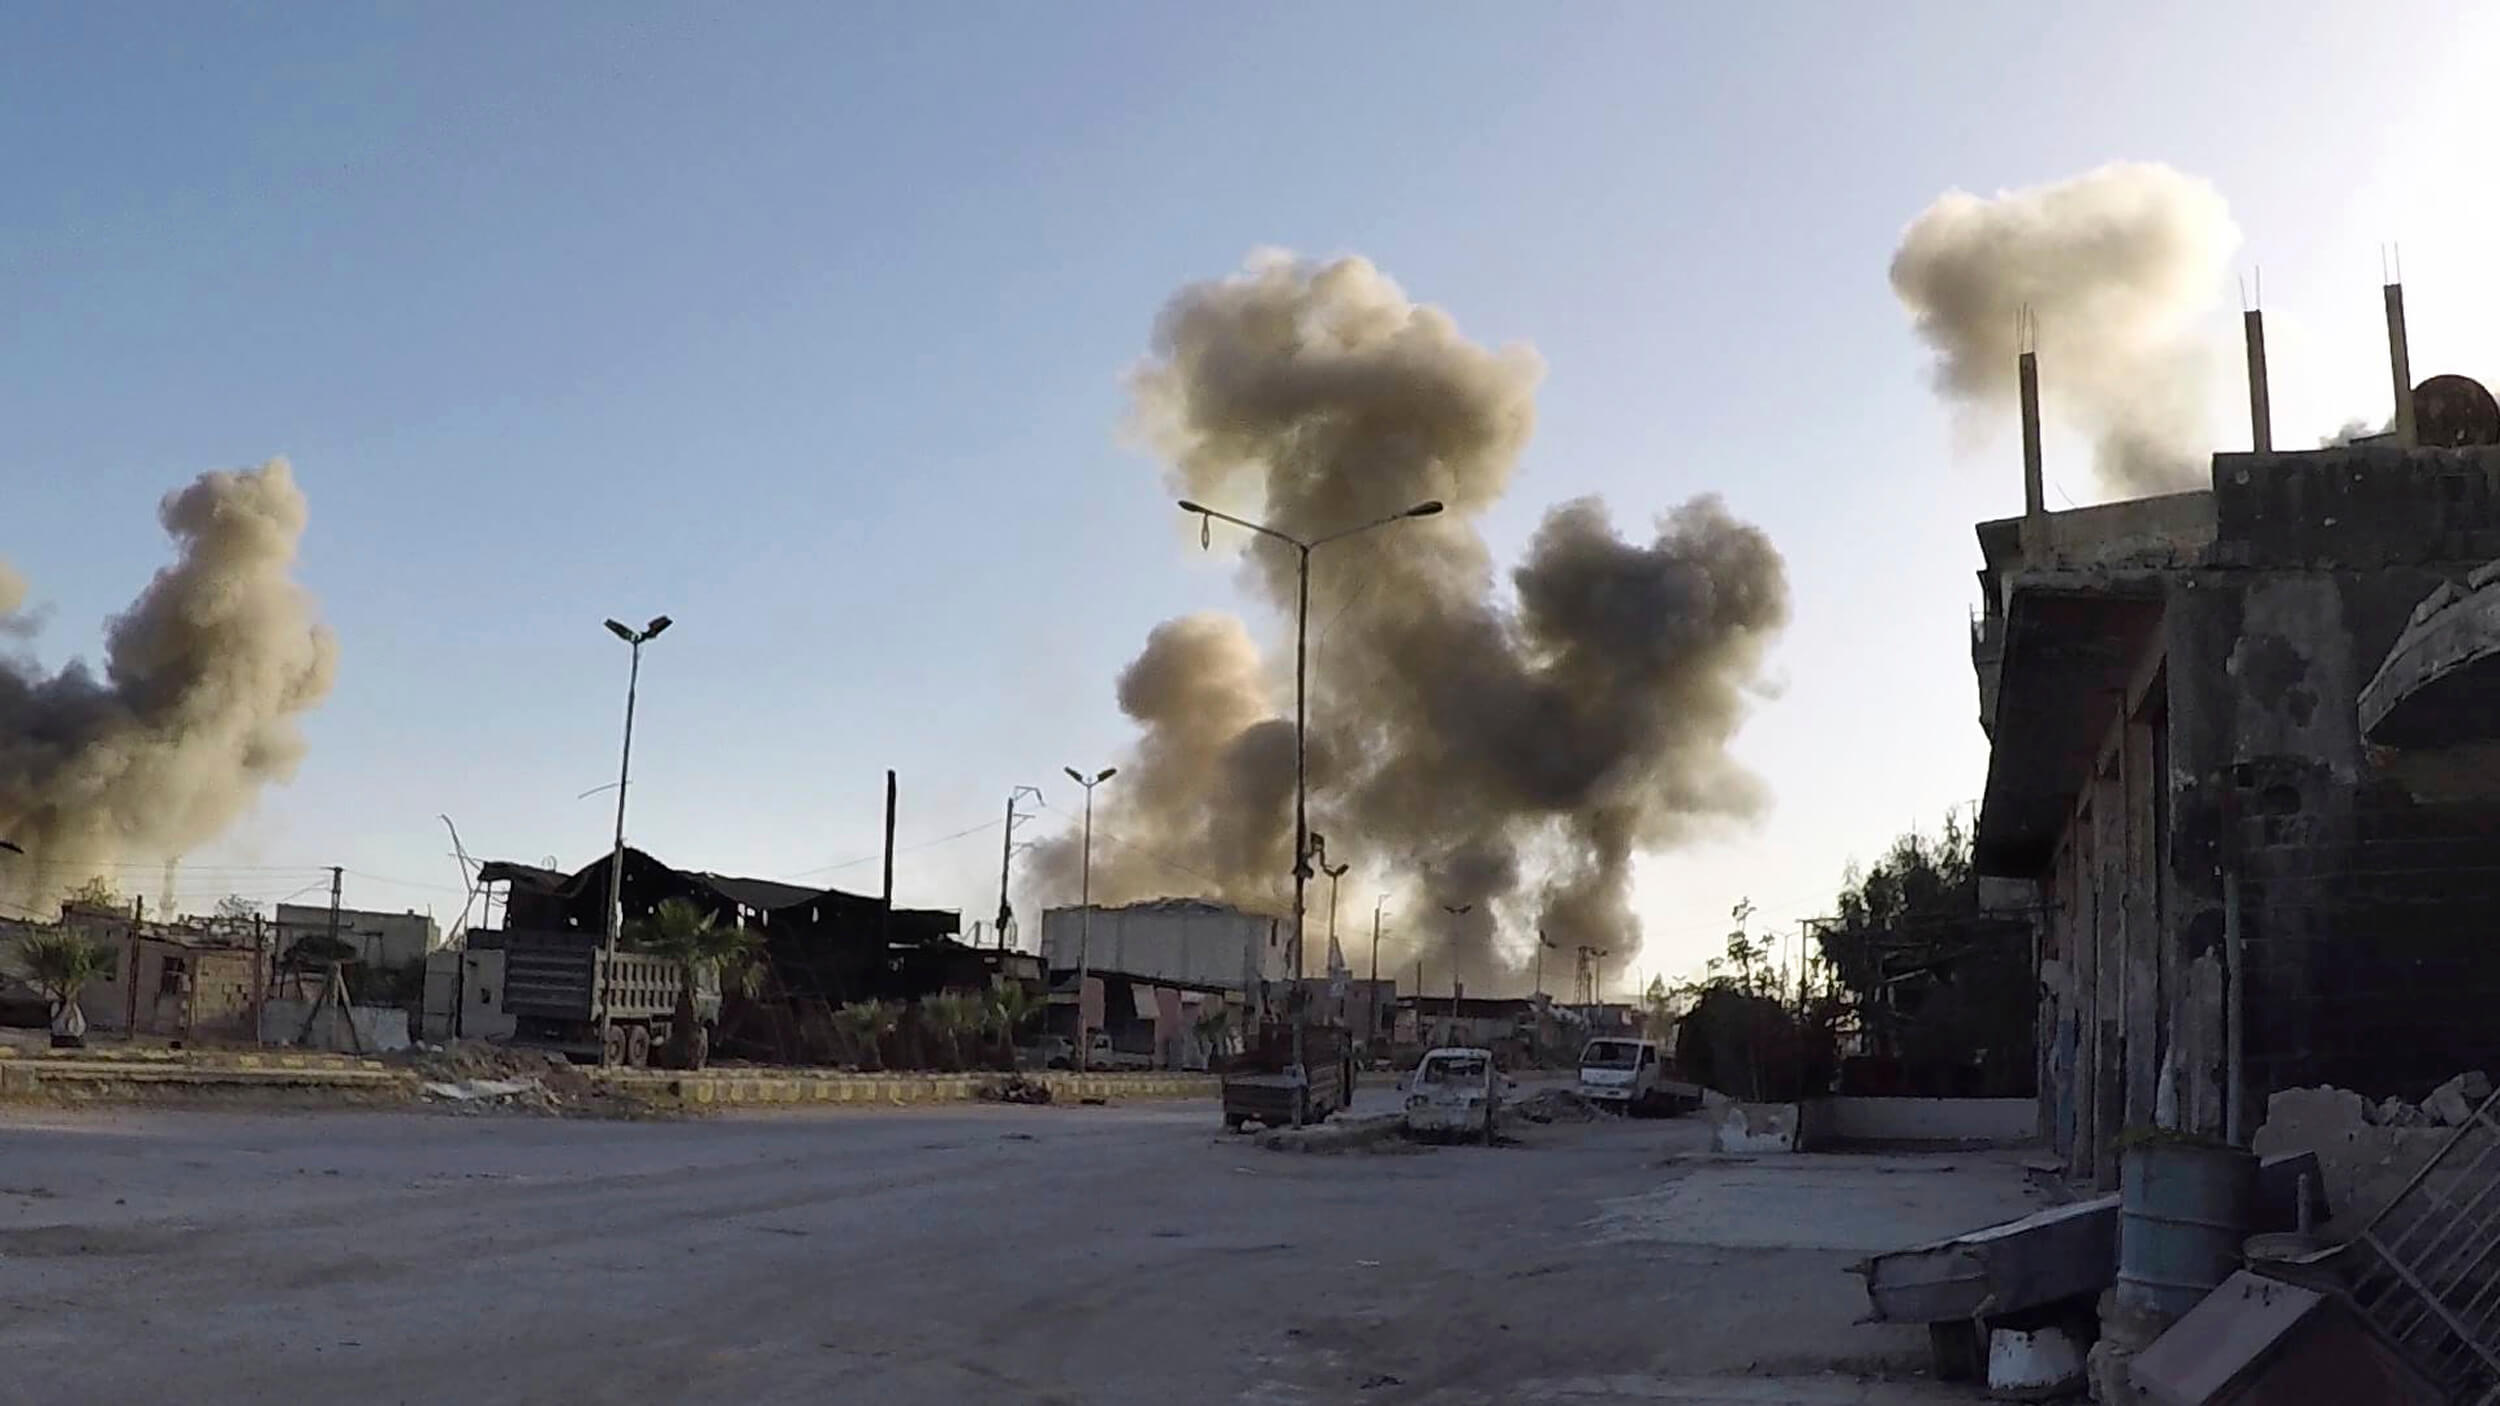 Inicia investigación de presunto ataque químico en Siria